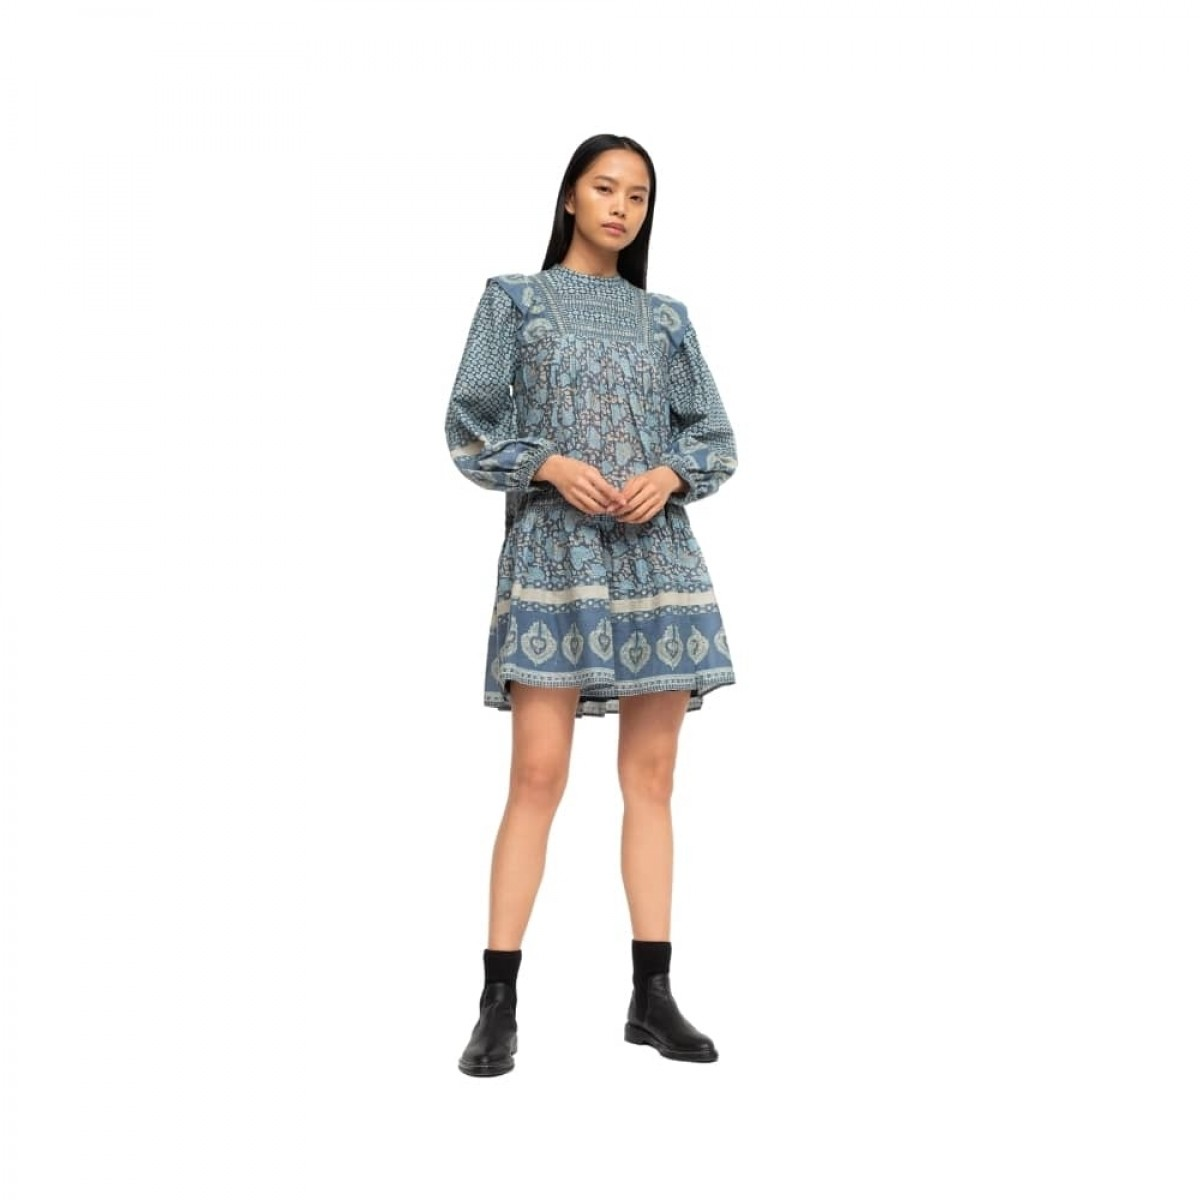 margo border tunic dress - ocean - model front